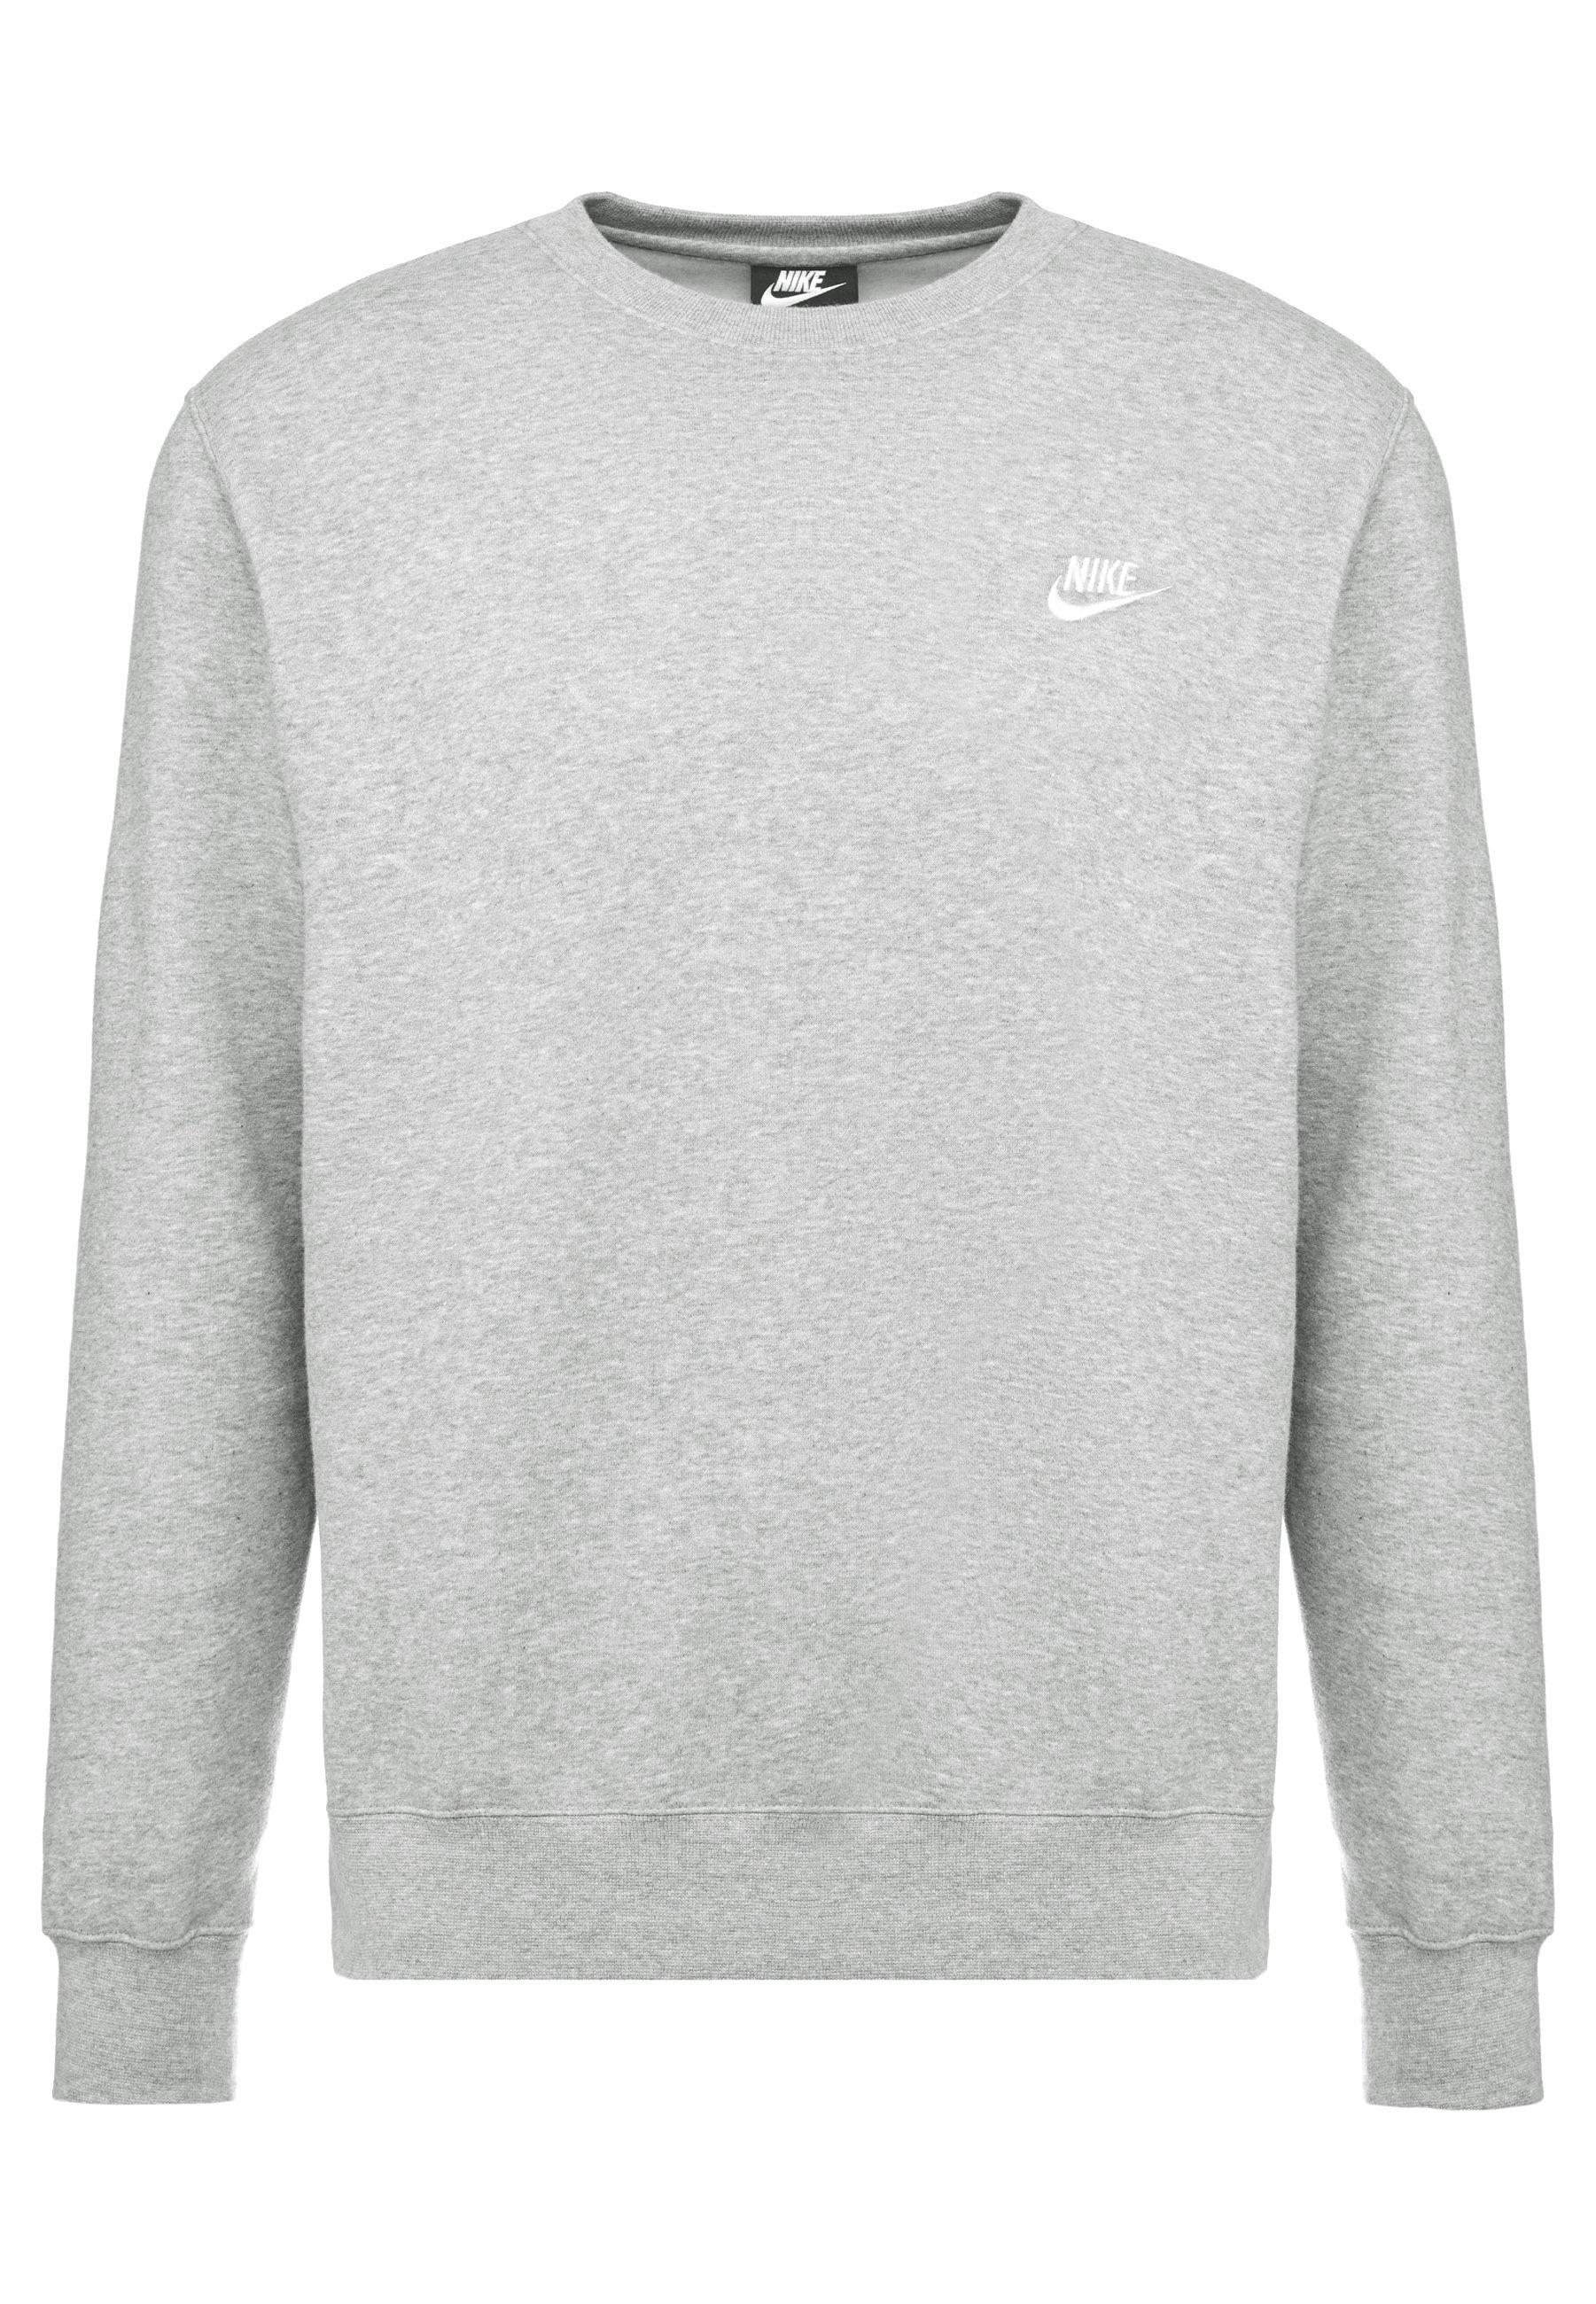 Nike sweater grijs | wehkamp